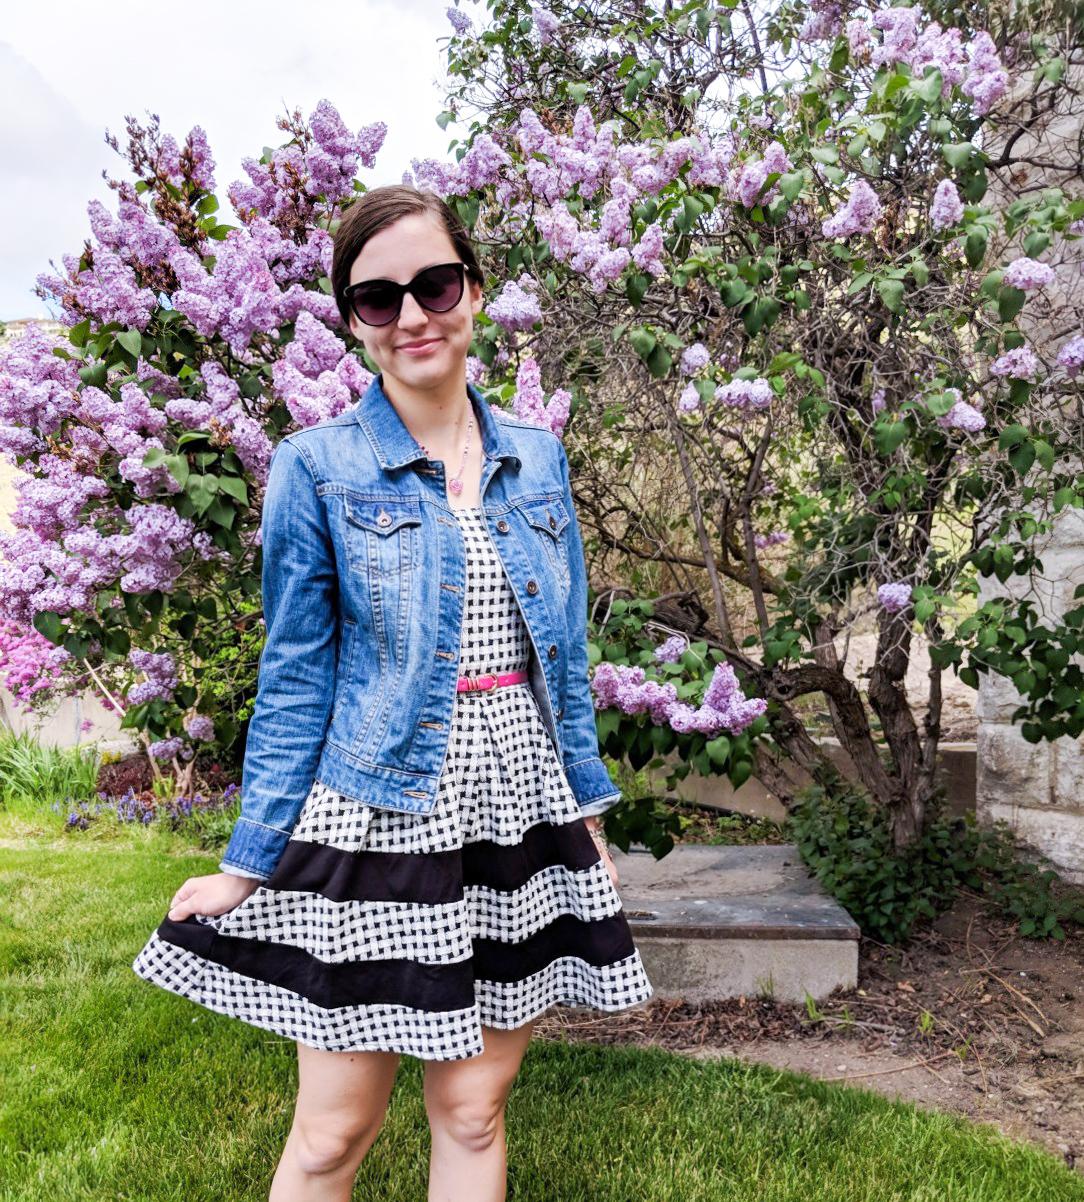 denim jacket, gingham dress, pink belt, purple flowers